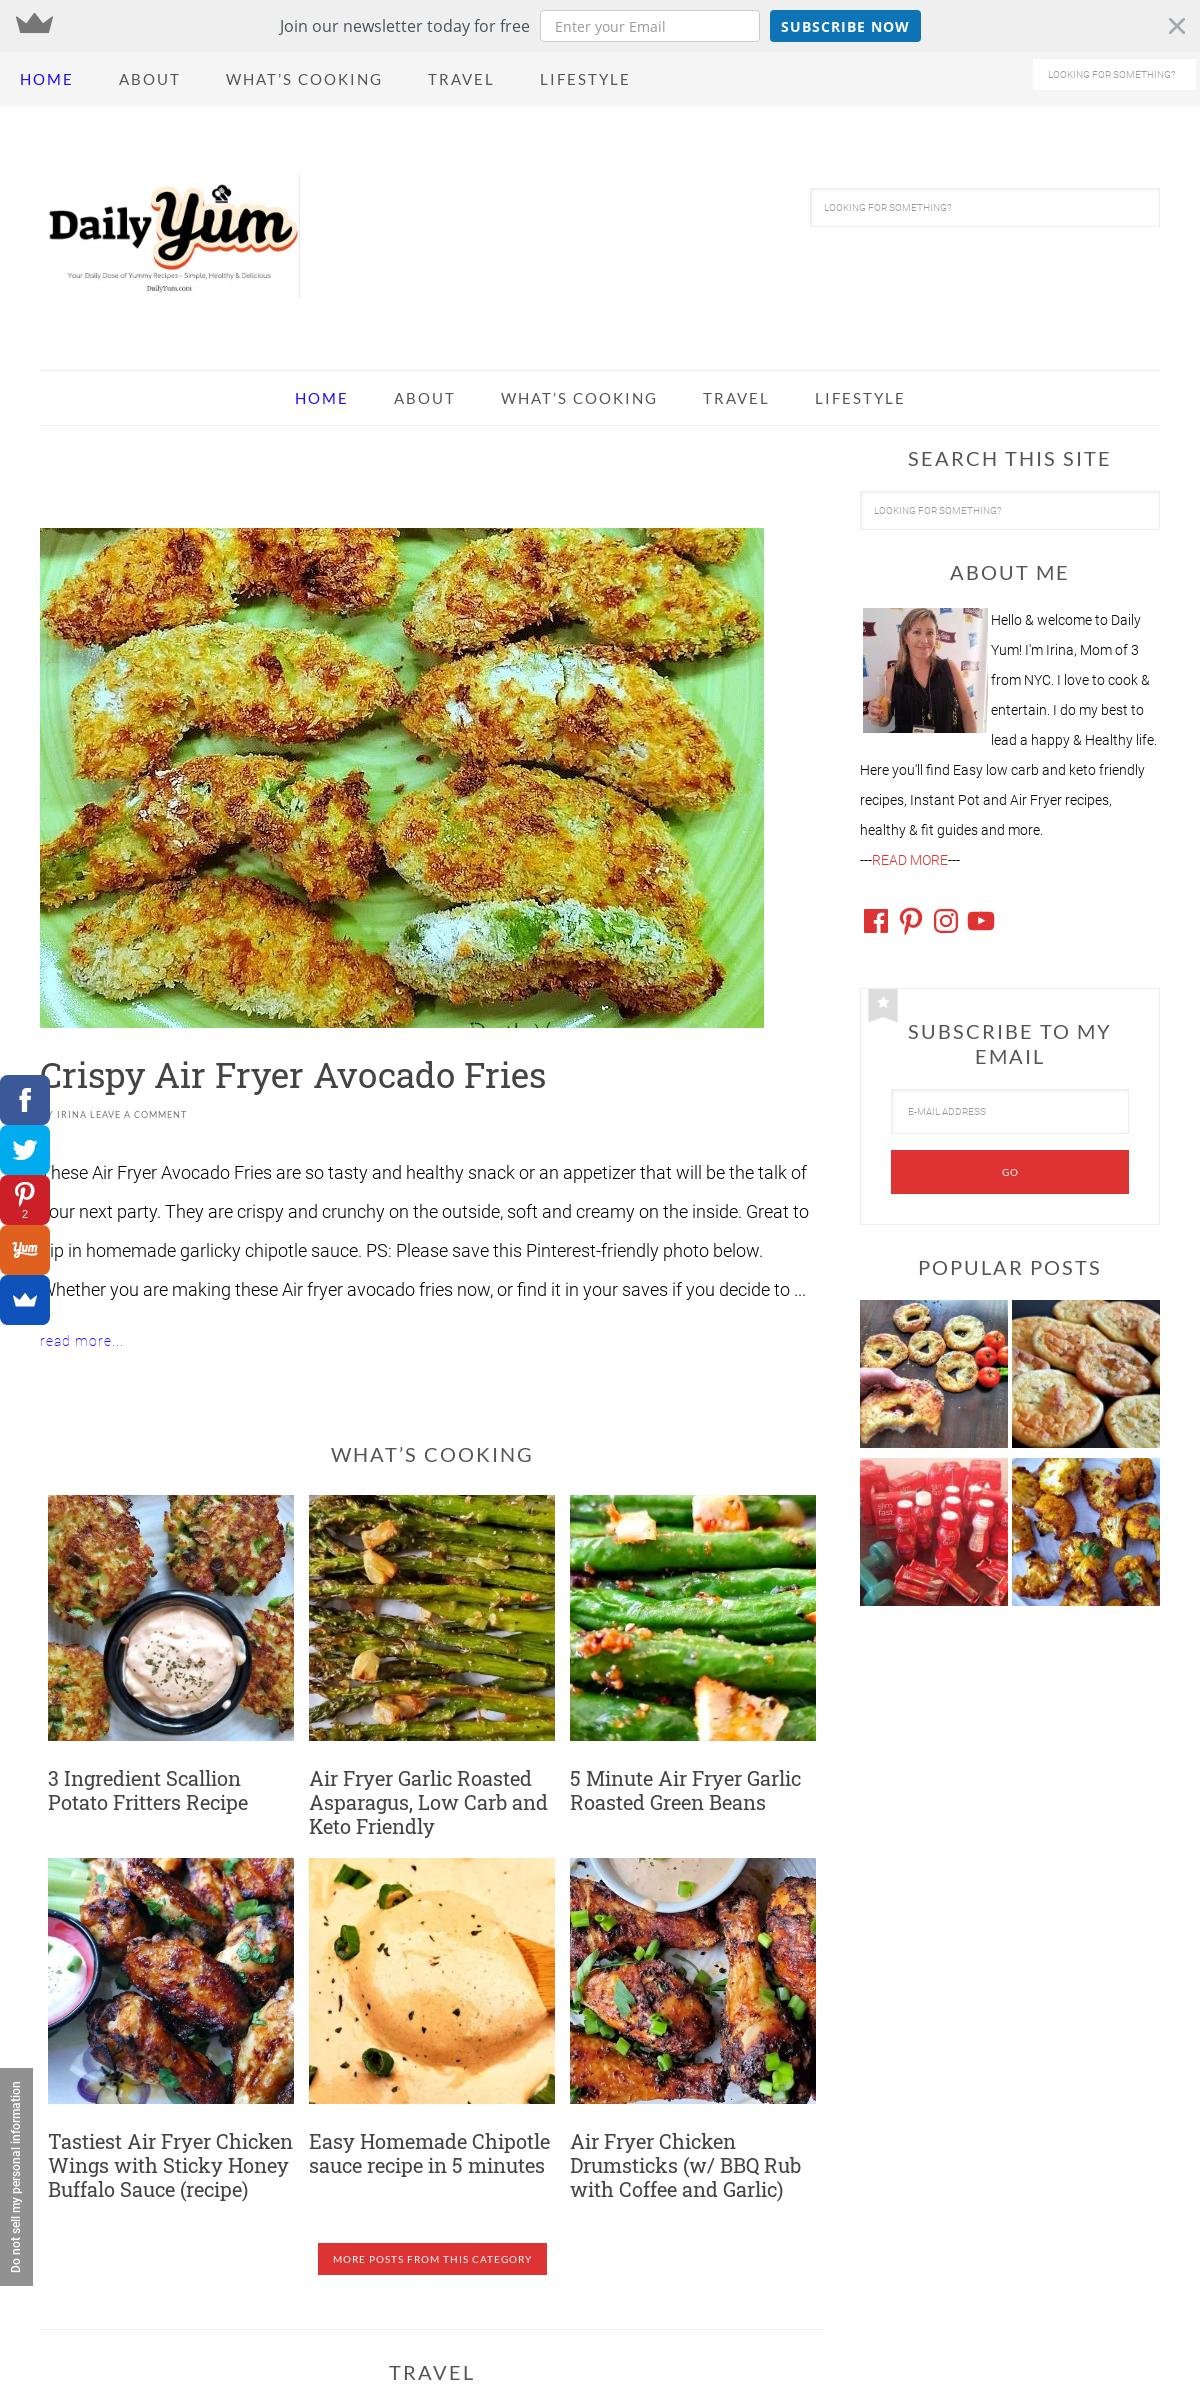 ArchiveBay.com - dailyyum.com - Daily Yum - Enjoy Tips on Food, Lifestyle and Healthy recipes